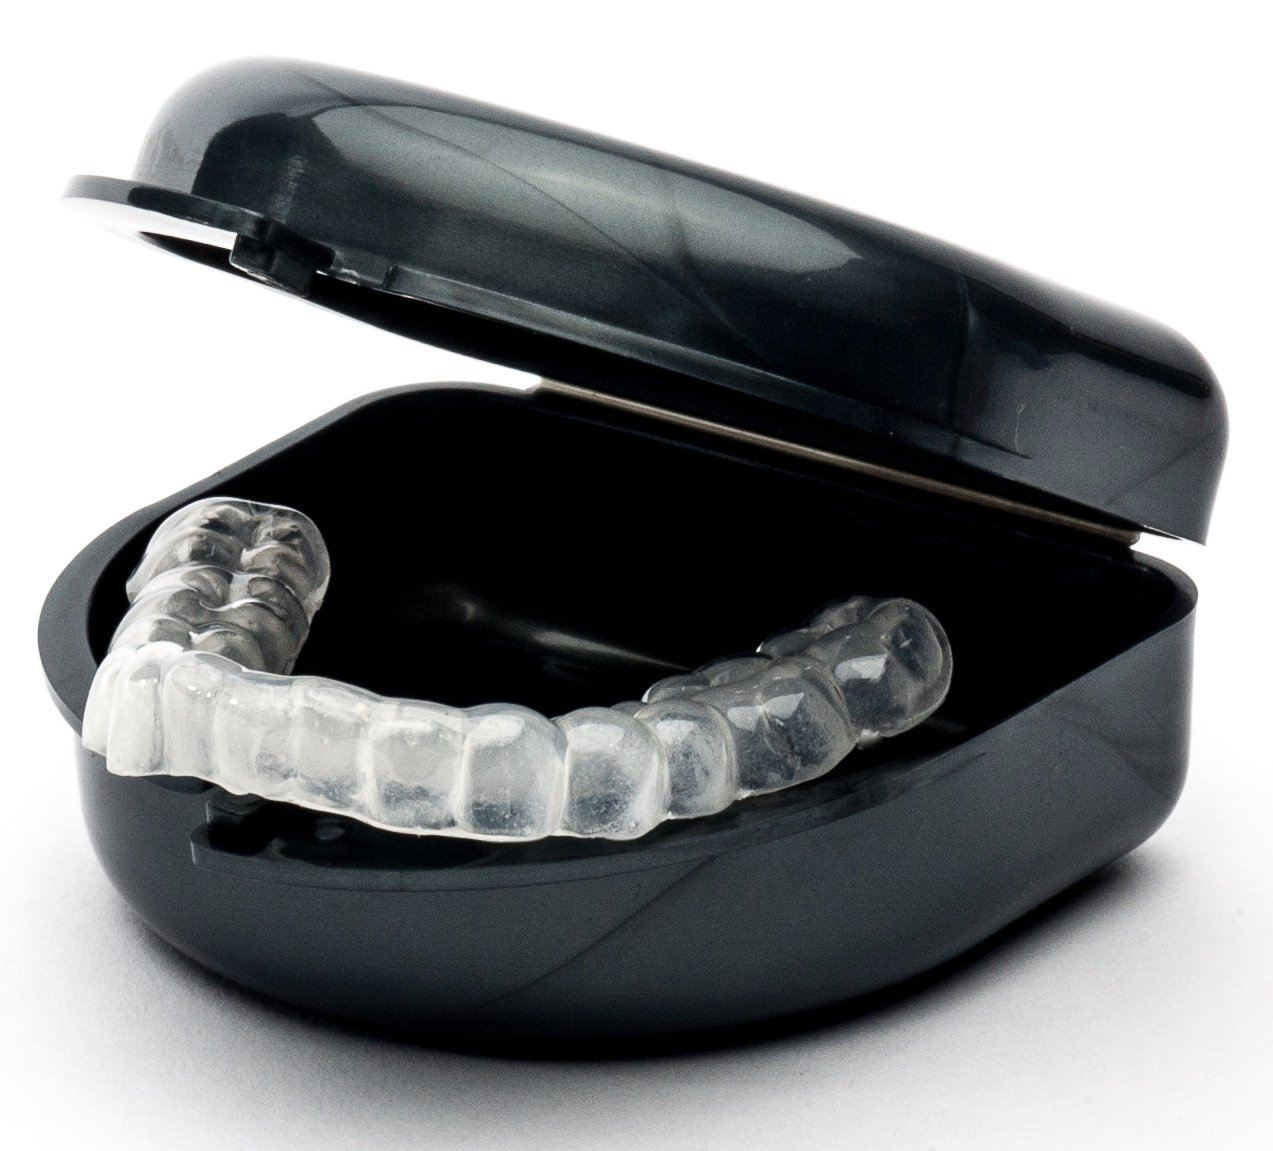 Sentinel Night Guard 2mm Dual Laminated Hybrid (soft inside & hard outside) for Upper Teeth Semi-Flexible Dental Teeth Protector Anti-Grinding (Upper Teeth)